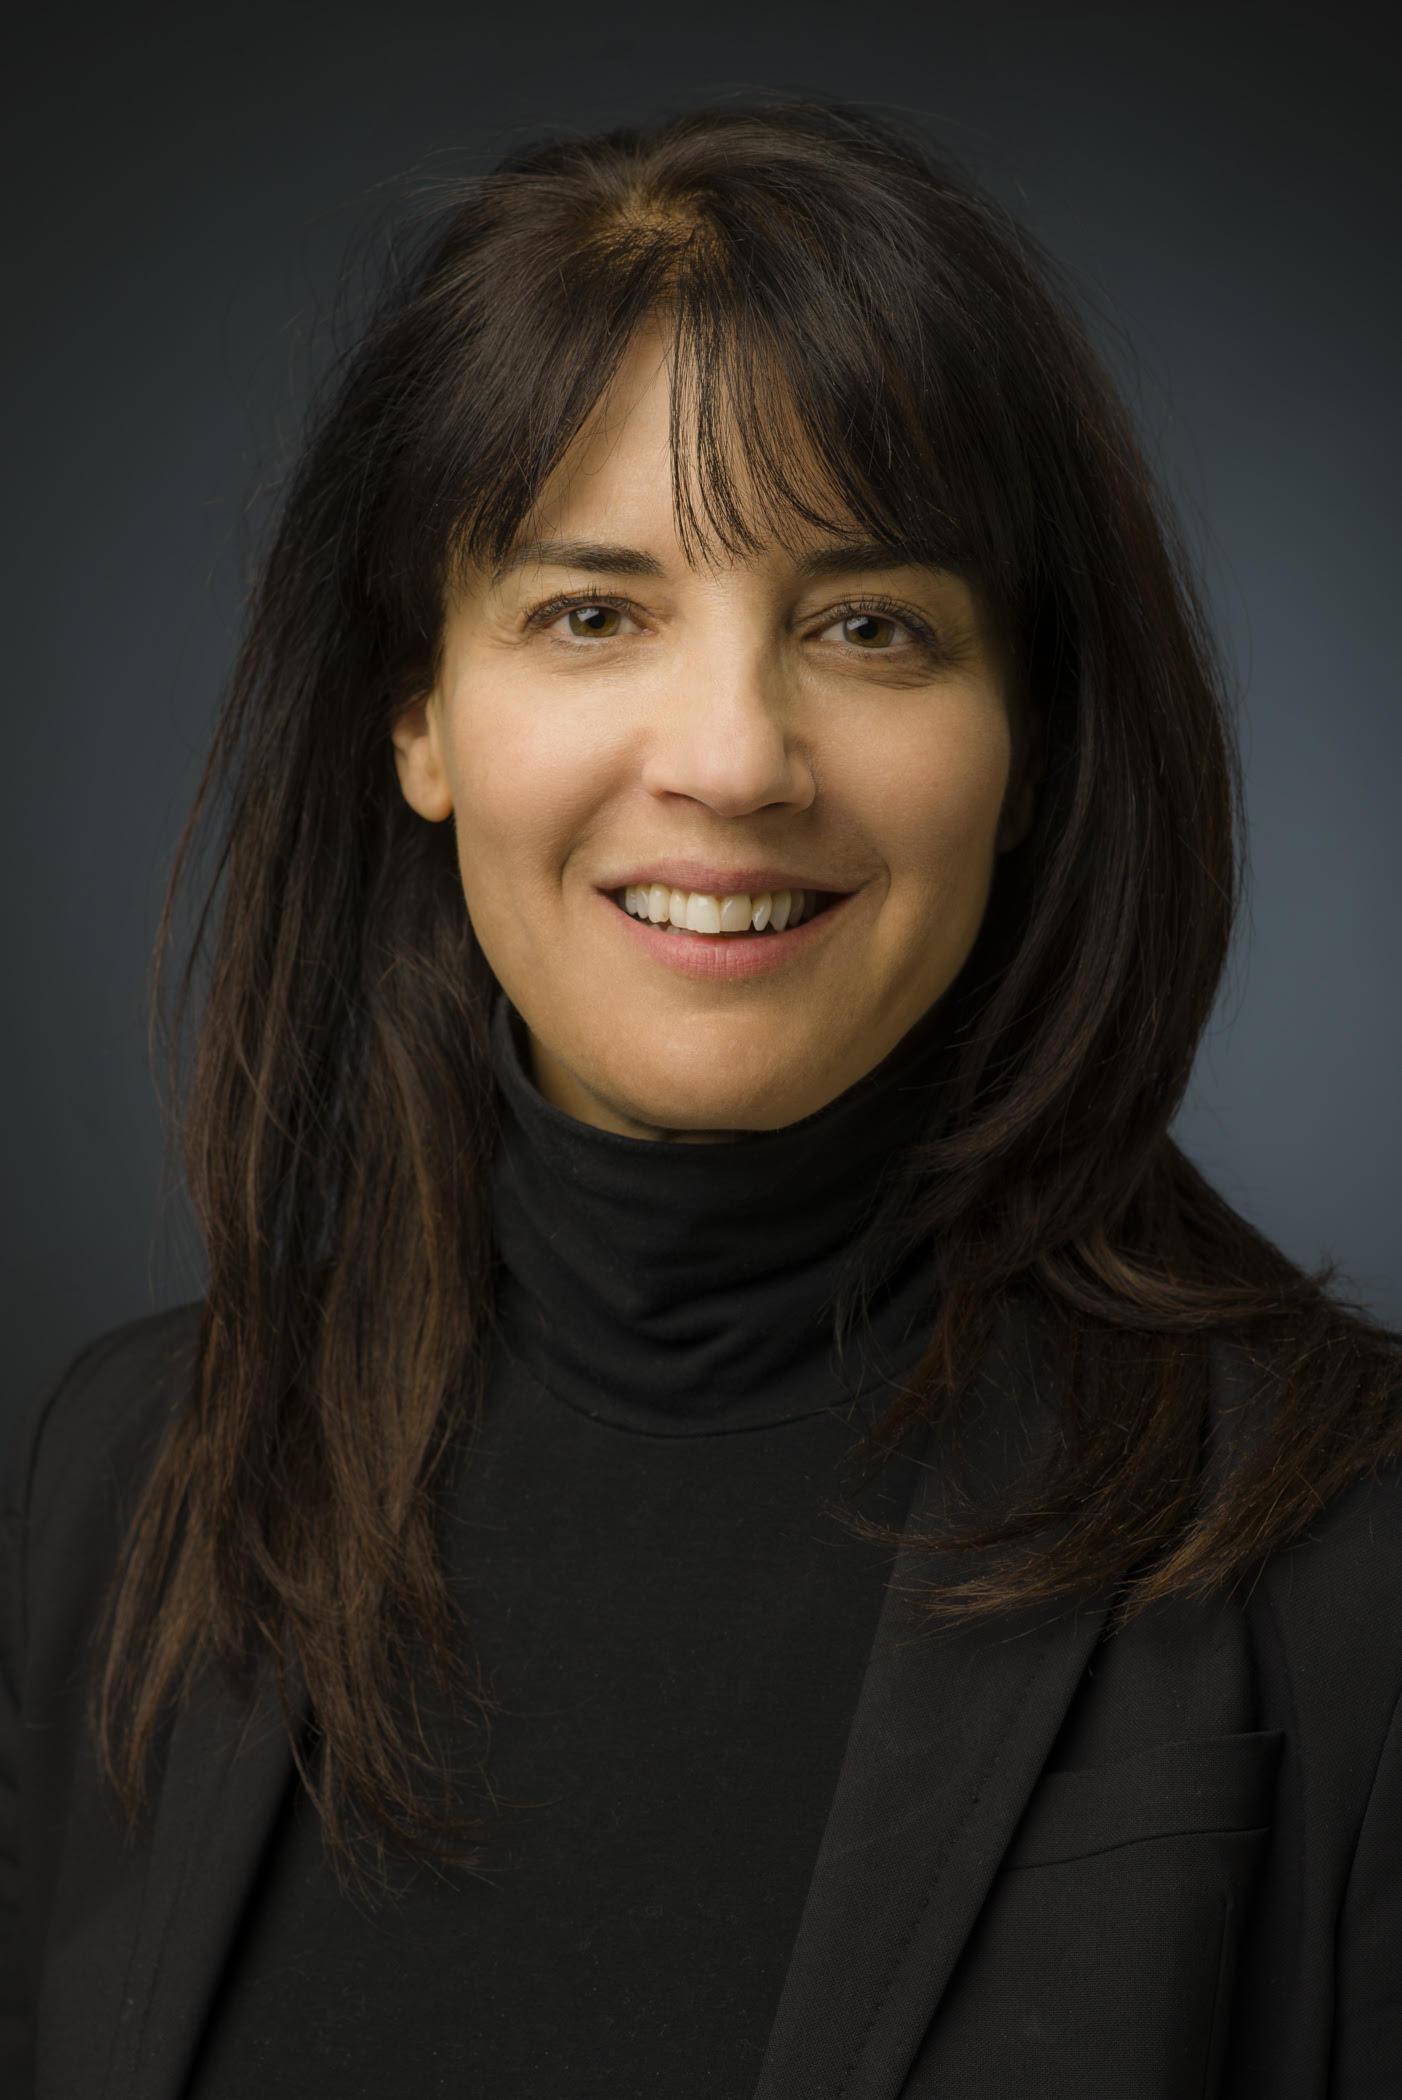 Dr. Eileen Rakovitch